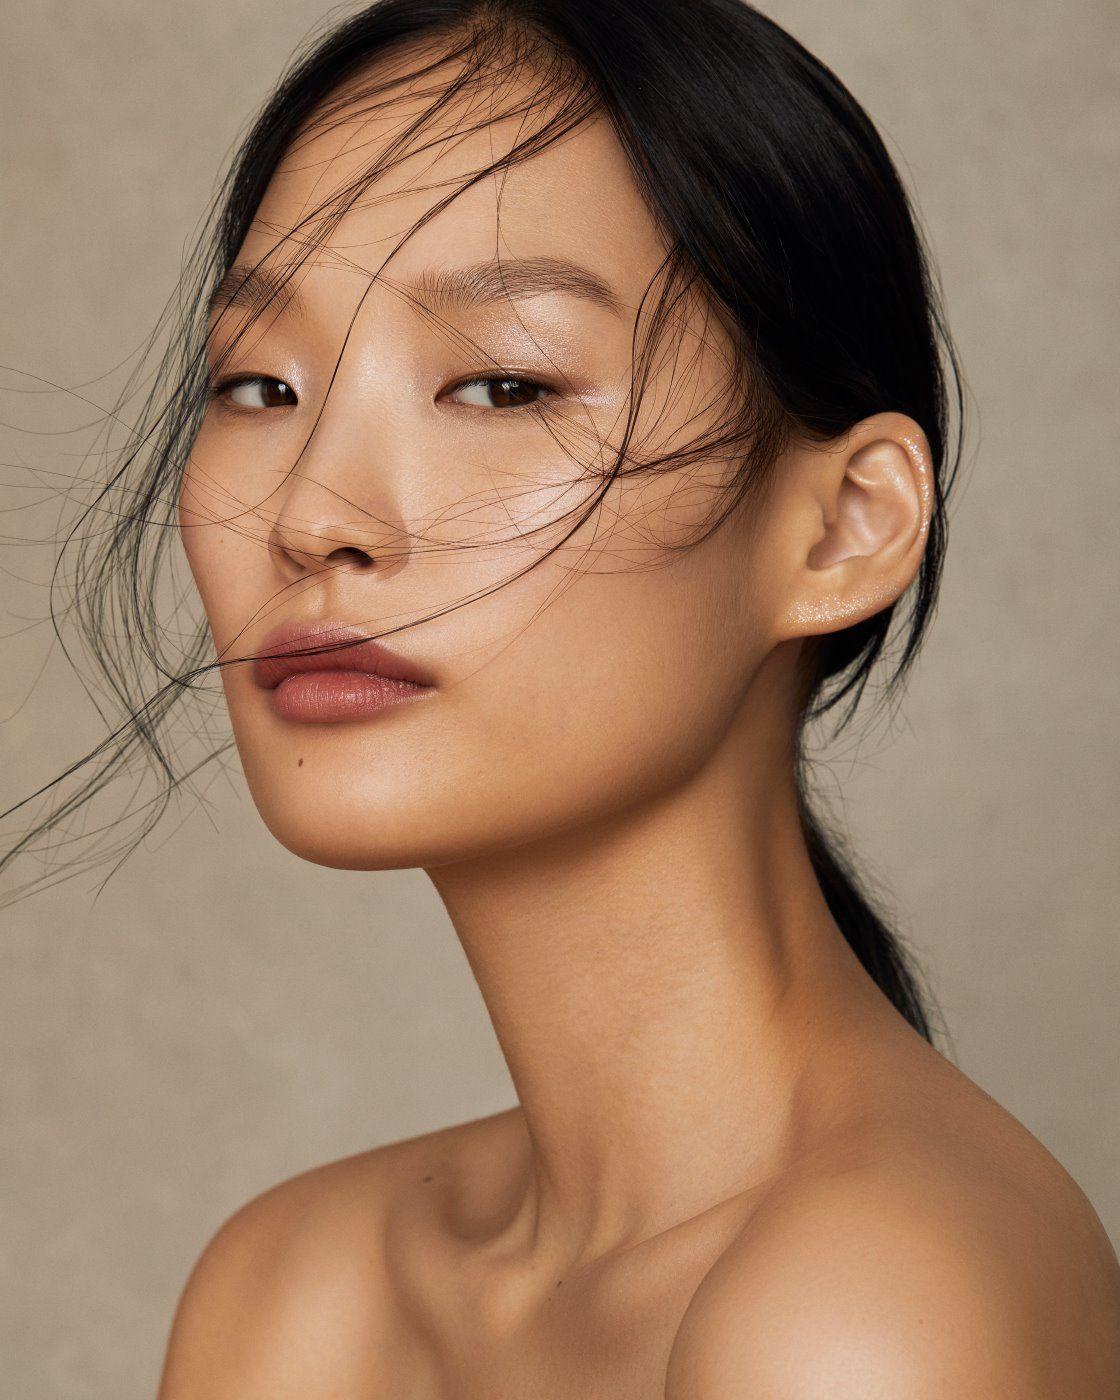 The Fashion Series by Lara Jade